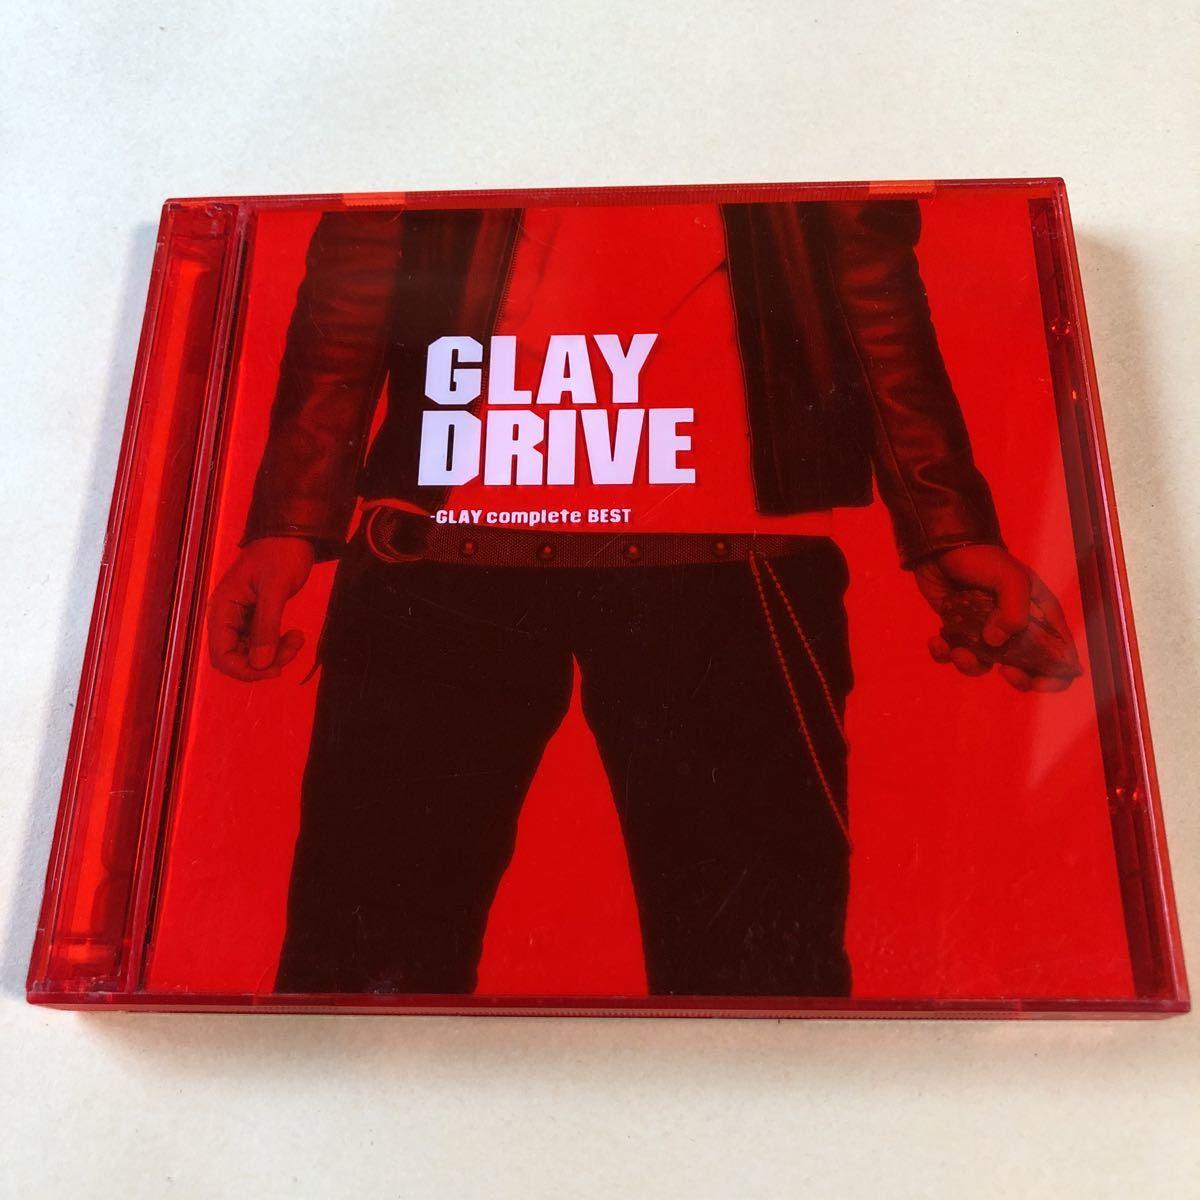 GLAY 2CD「GLAY DRIVE-GLAY complete BEST-」_画像1